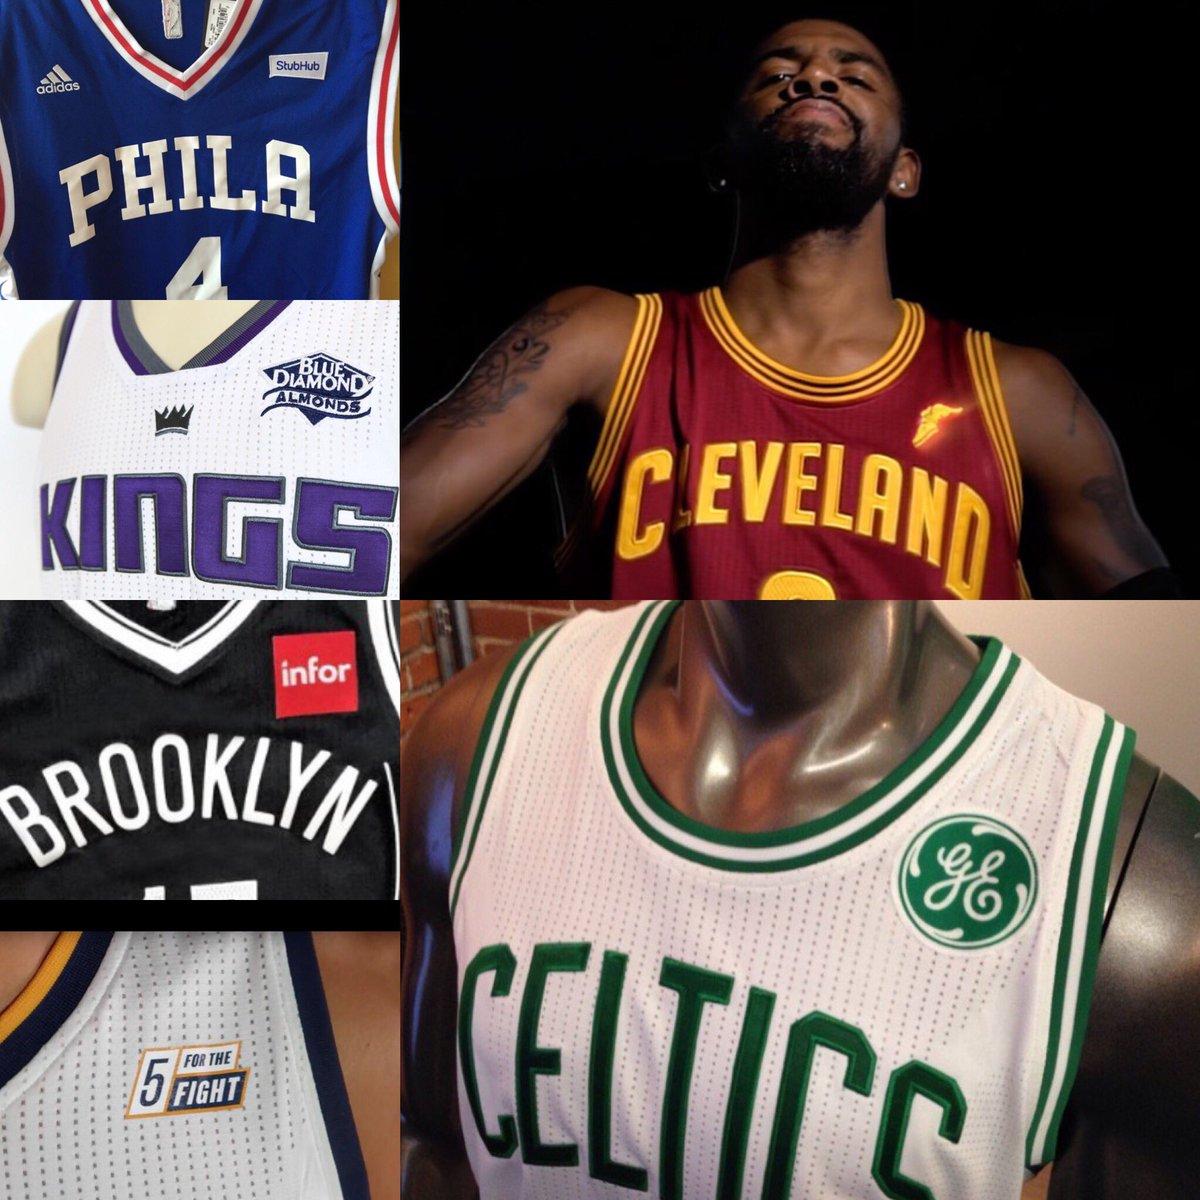 f38121ef7 Uniforms—Logos—Court Designs—Socks—Sneakers—Headbands—Mouthguards